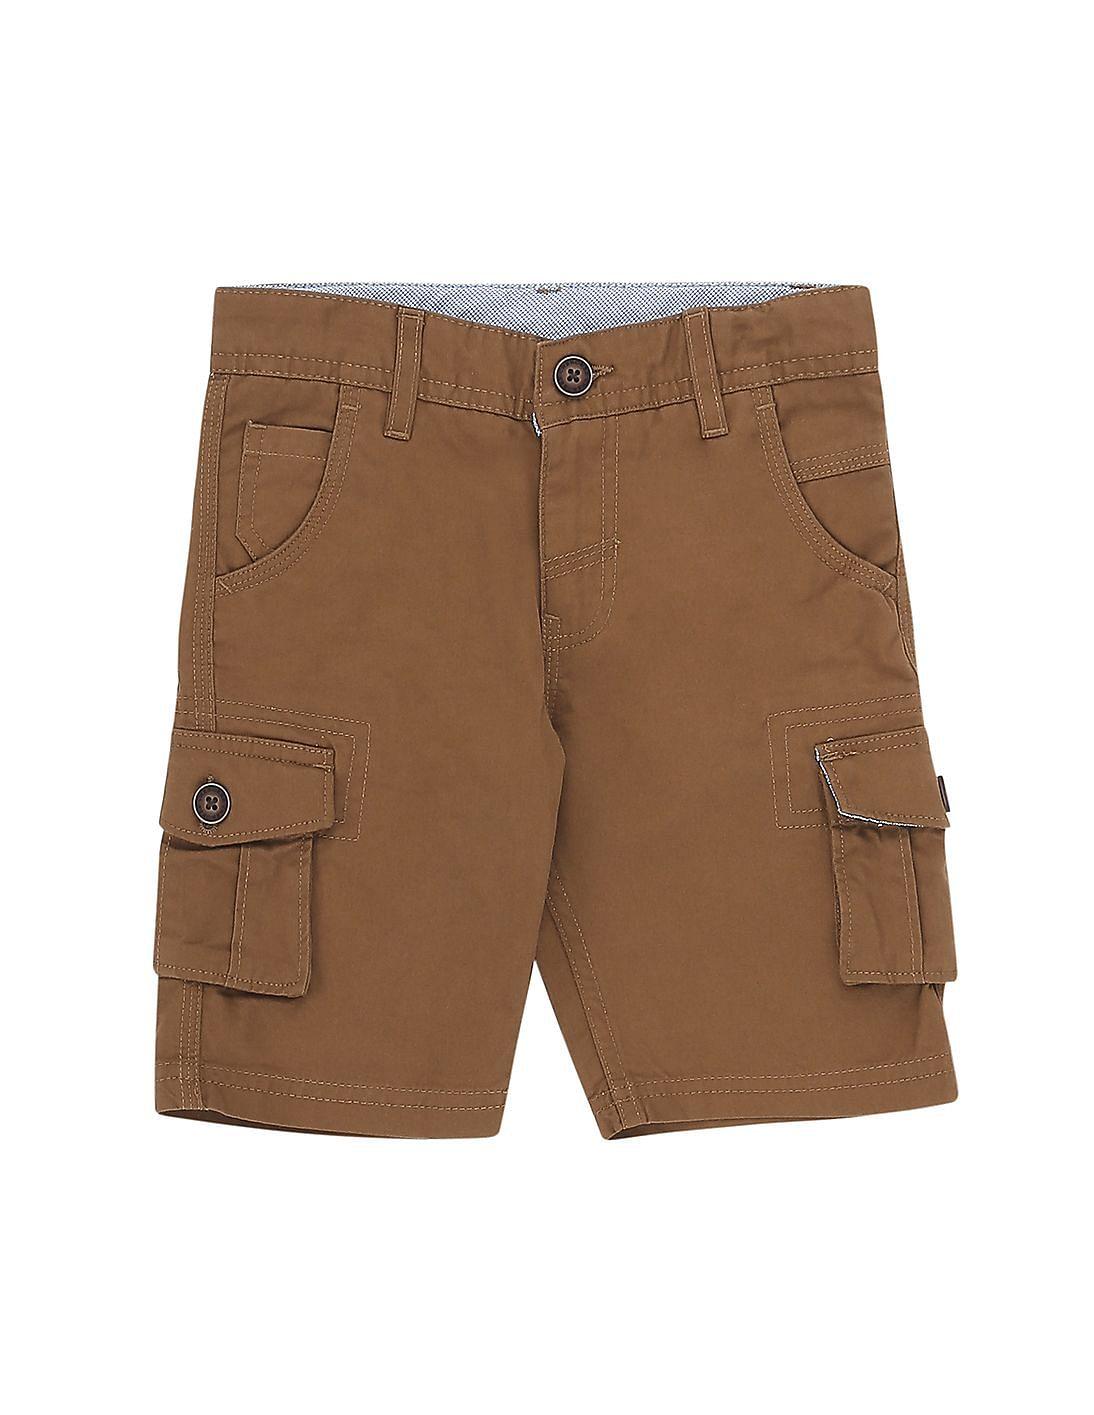 89151b9eb Buy Boys Boys Cotton Cargo Shorts online at NNNOW.com